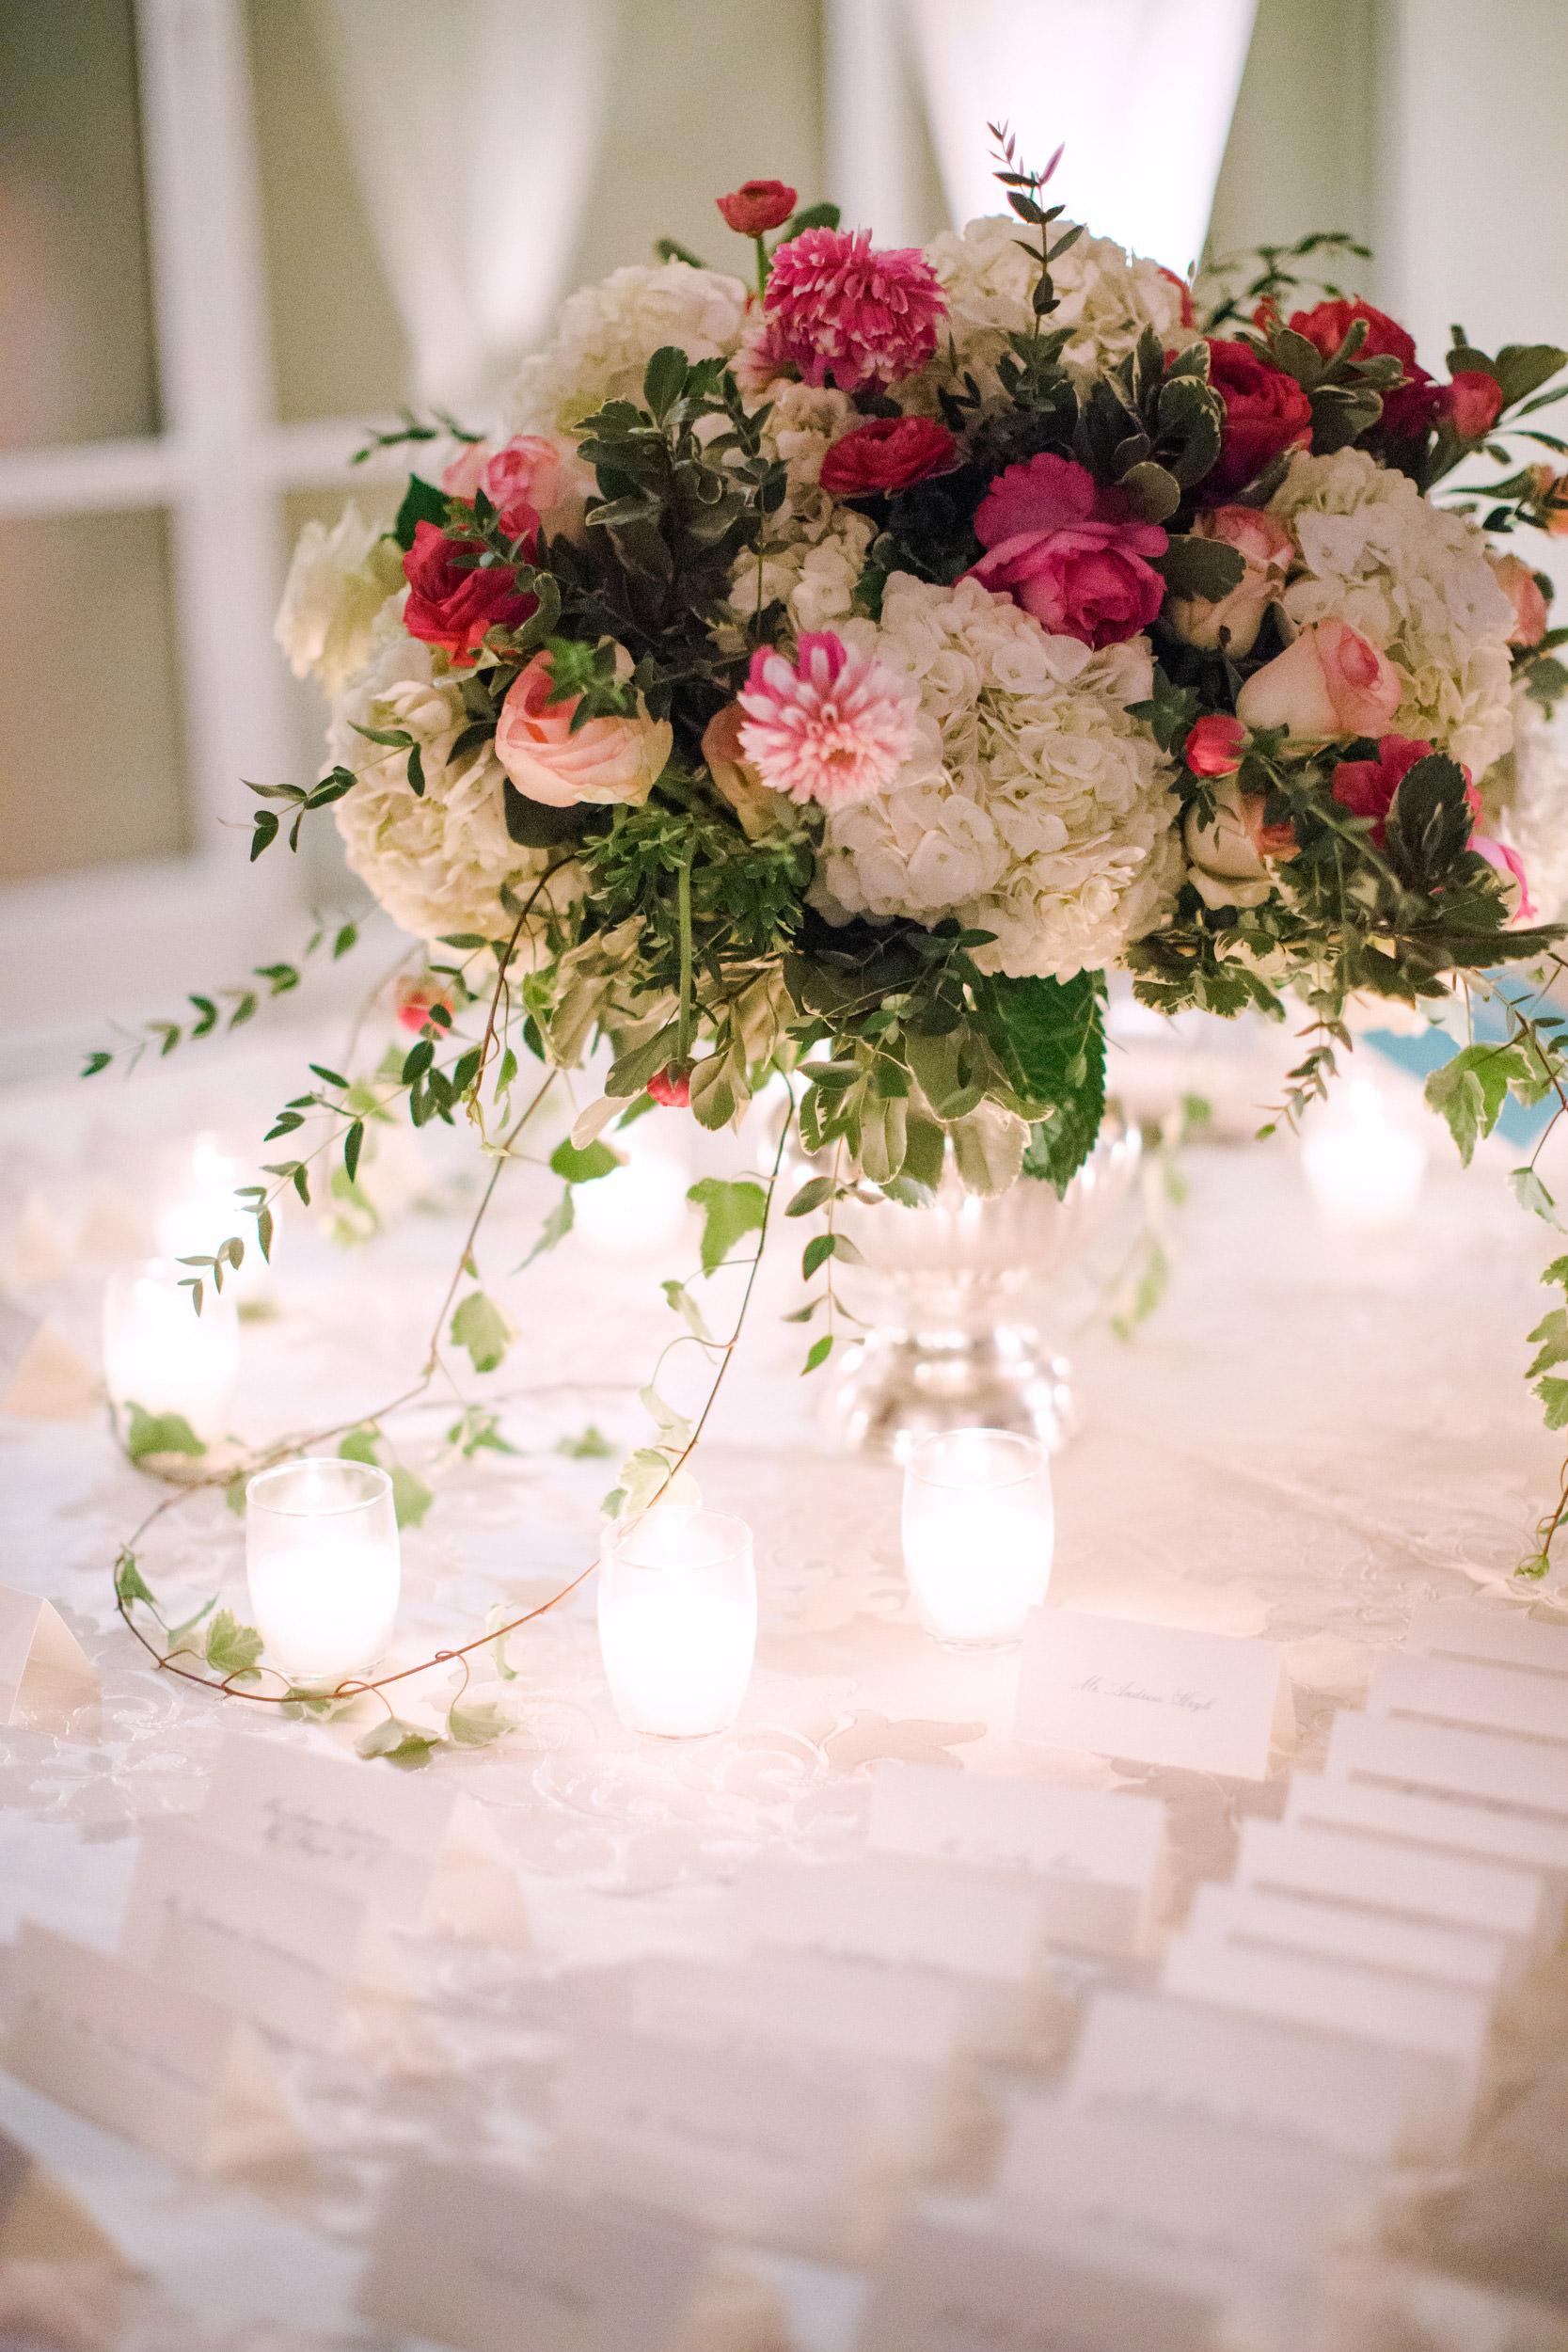 biltmore_santa_barbara_wedding_photos_coral_casino_044.jpg